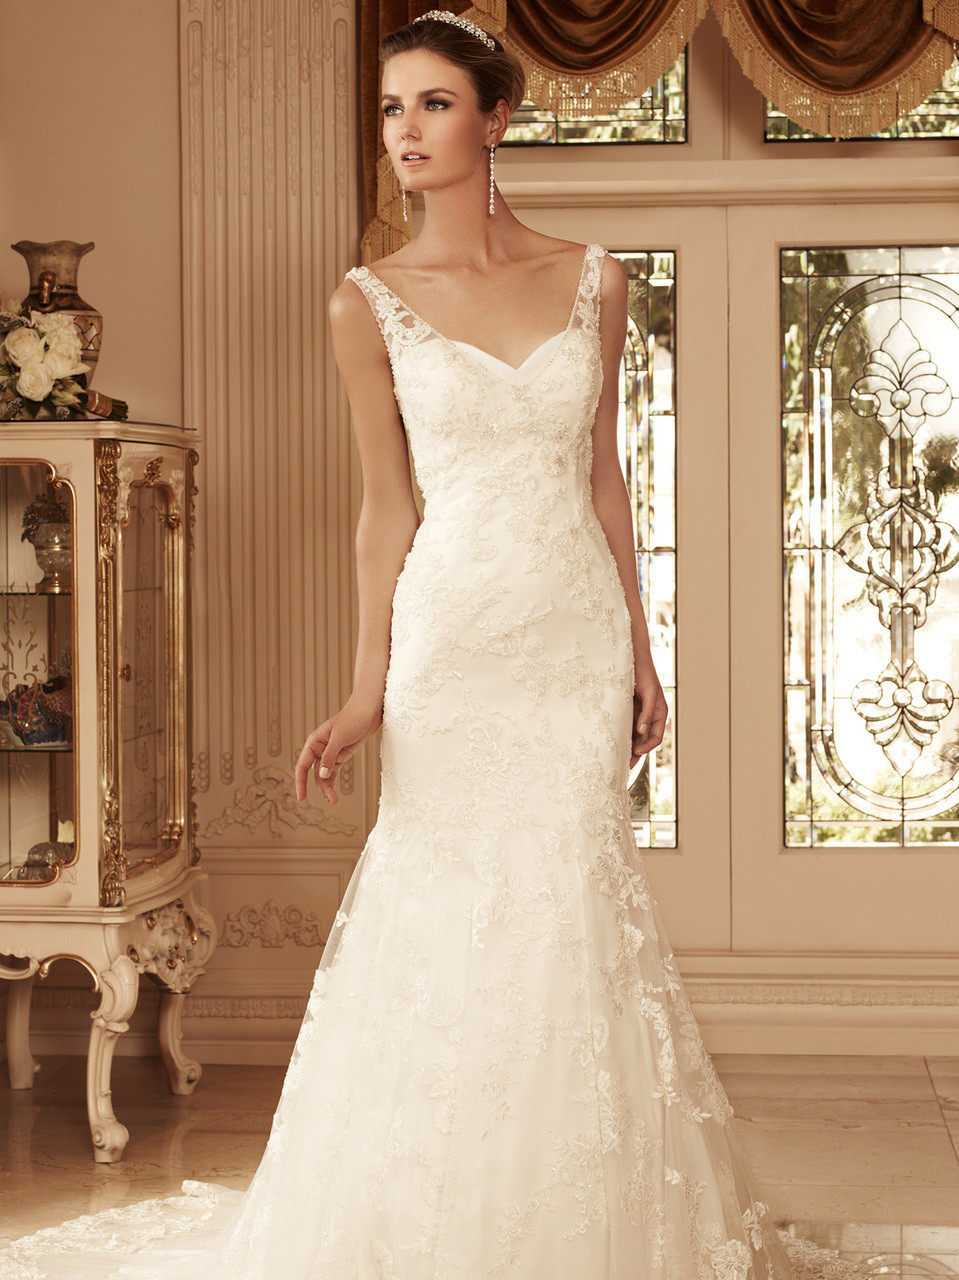 Sweetheart Trumpet Bridal Gown Casablanca Bridal Gown 2099 Dimitradesigns Com